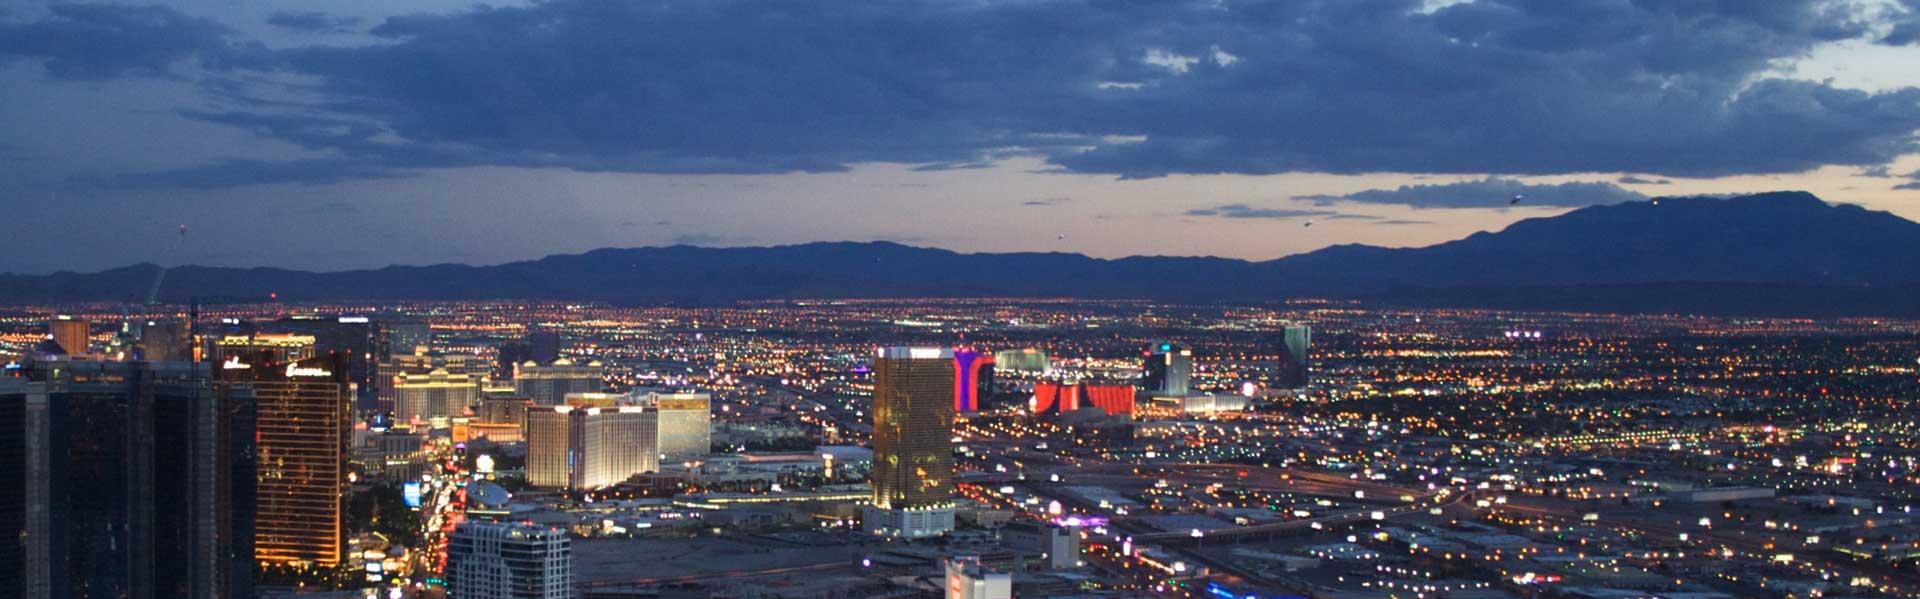 Vegas Nachtrondvlucht